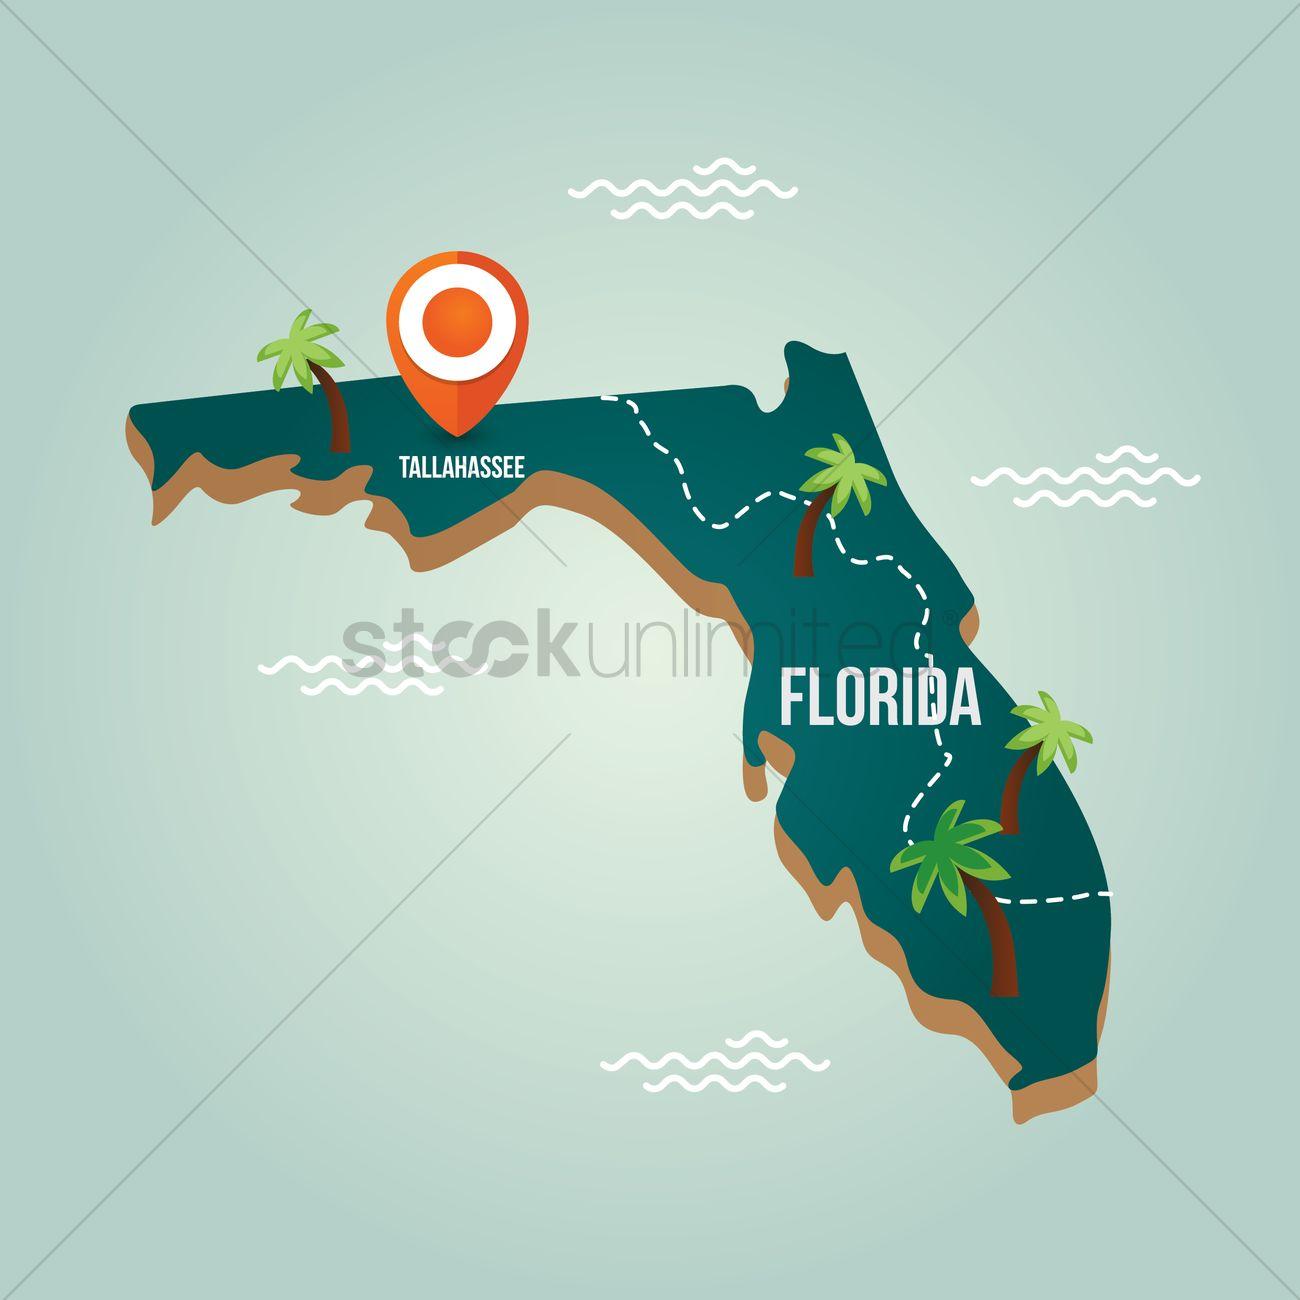 Oklahoma State States Location Pin Usa America United States Us - Florida map location